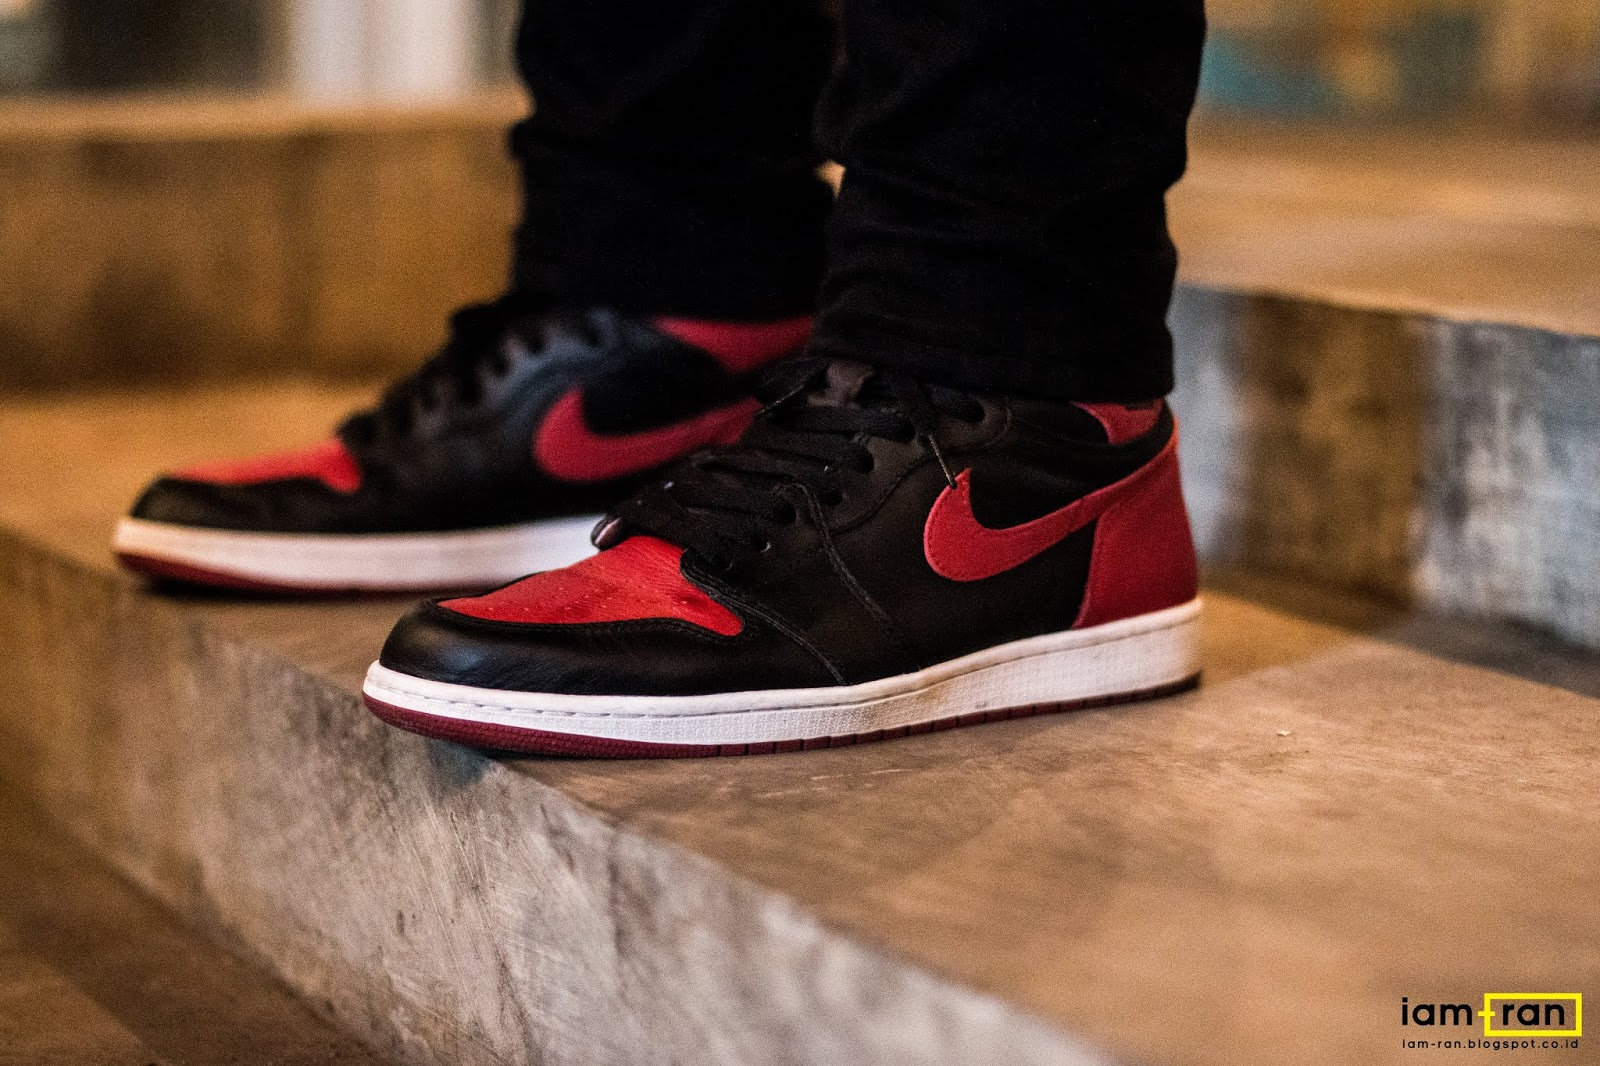 promo code d6687 9b004 IAM-RAN: ON FEET : Ryan - Nike Air Jordan 1